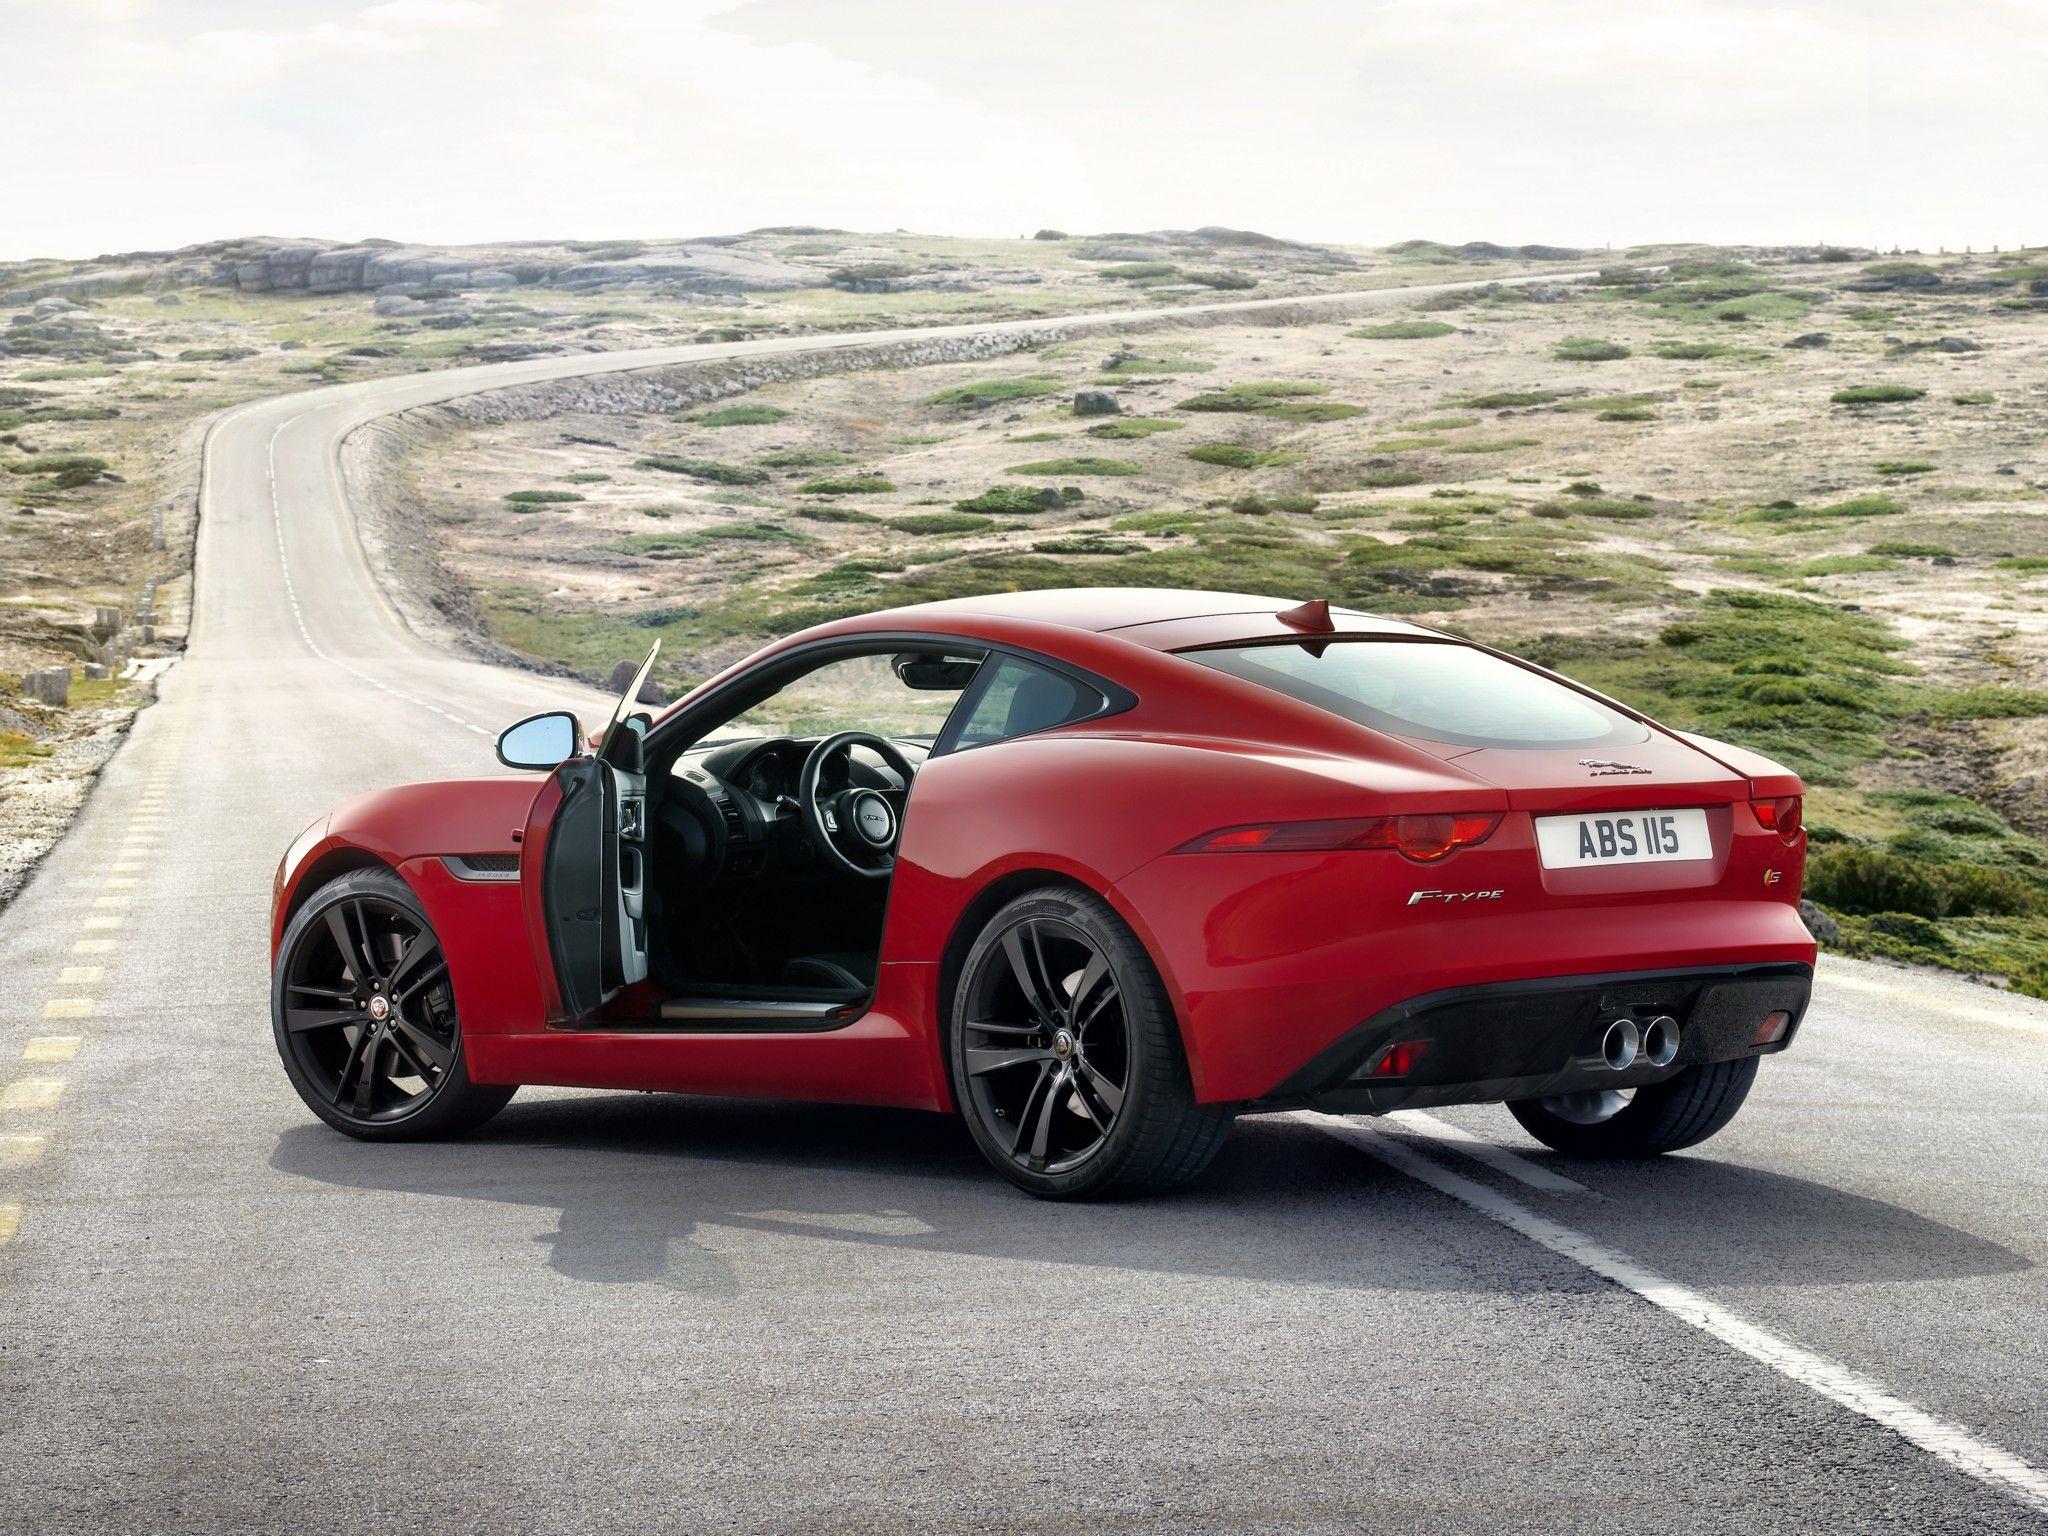 2014 jaguar f type s coupe go ahead get in